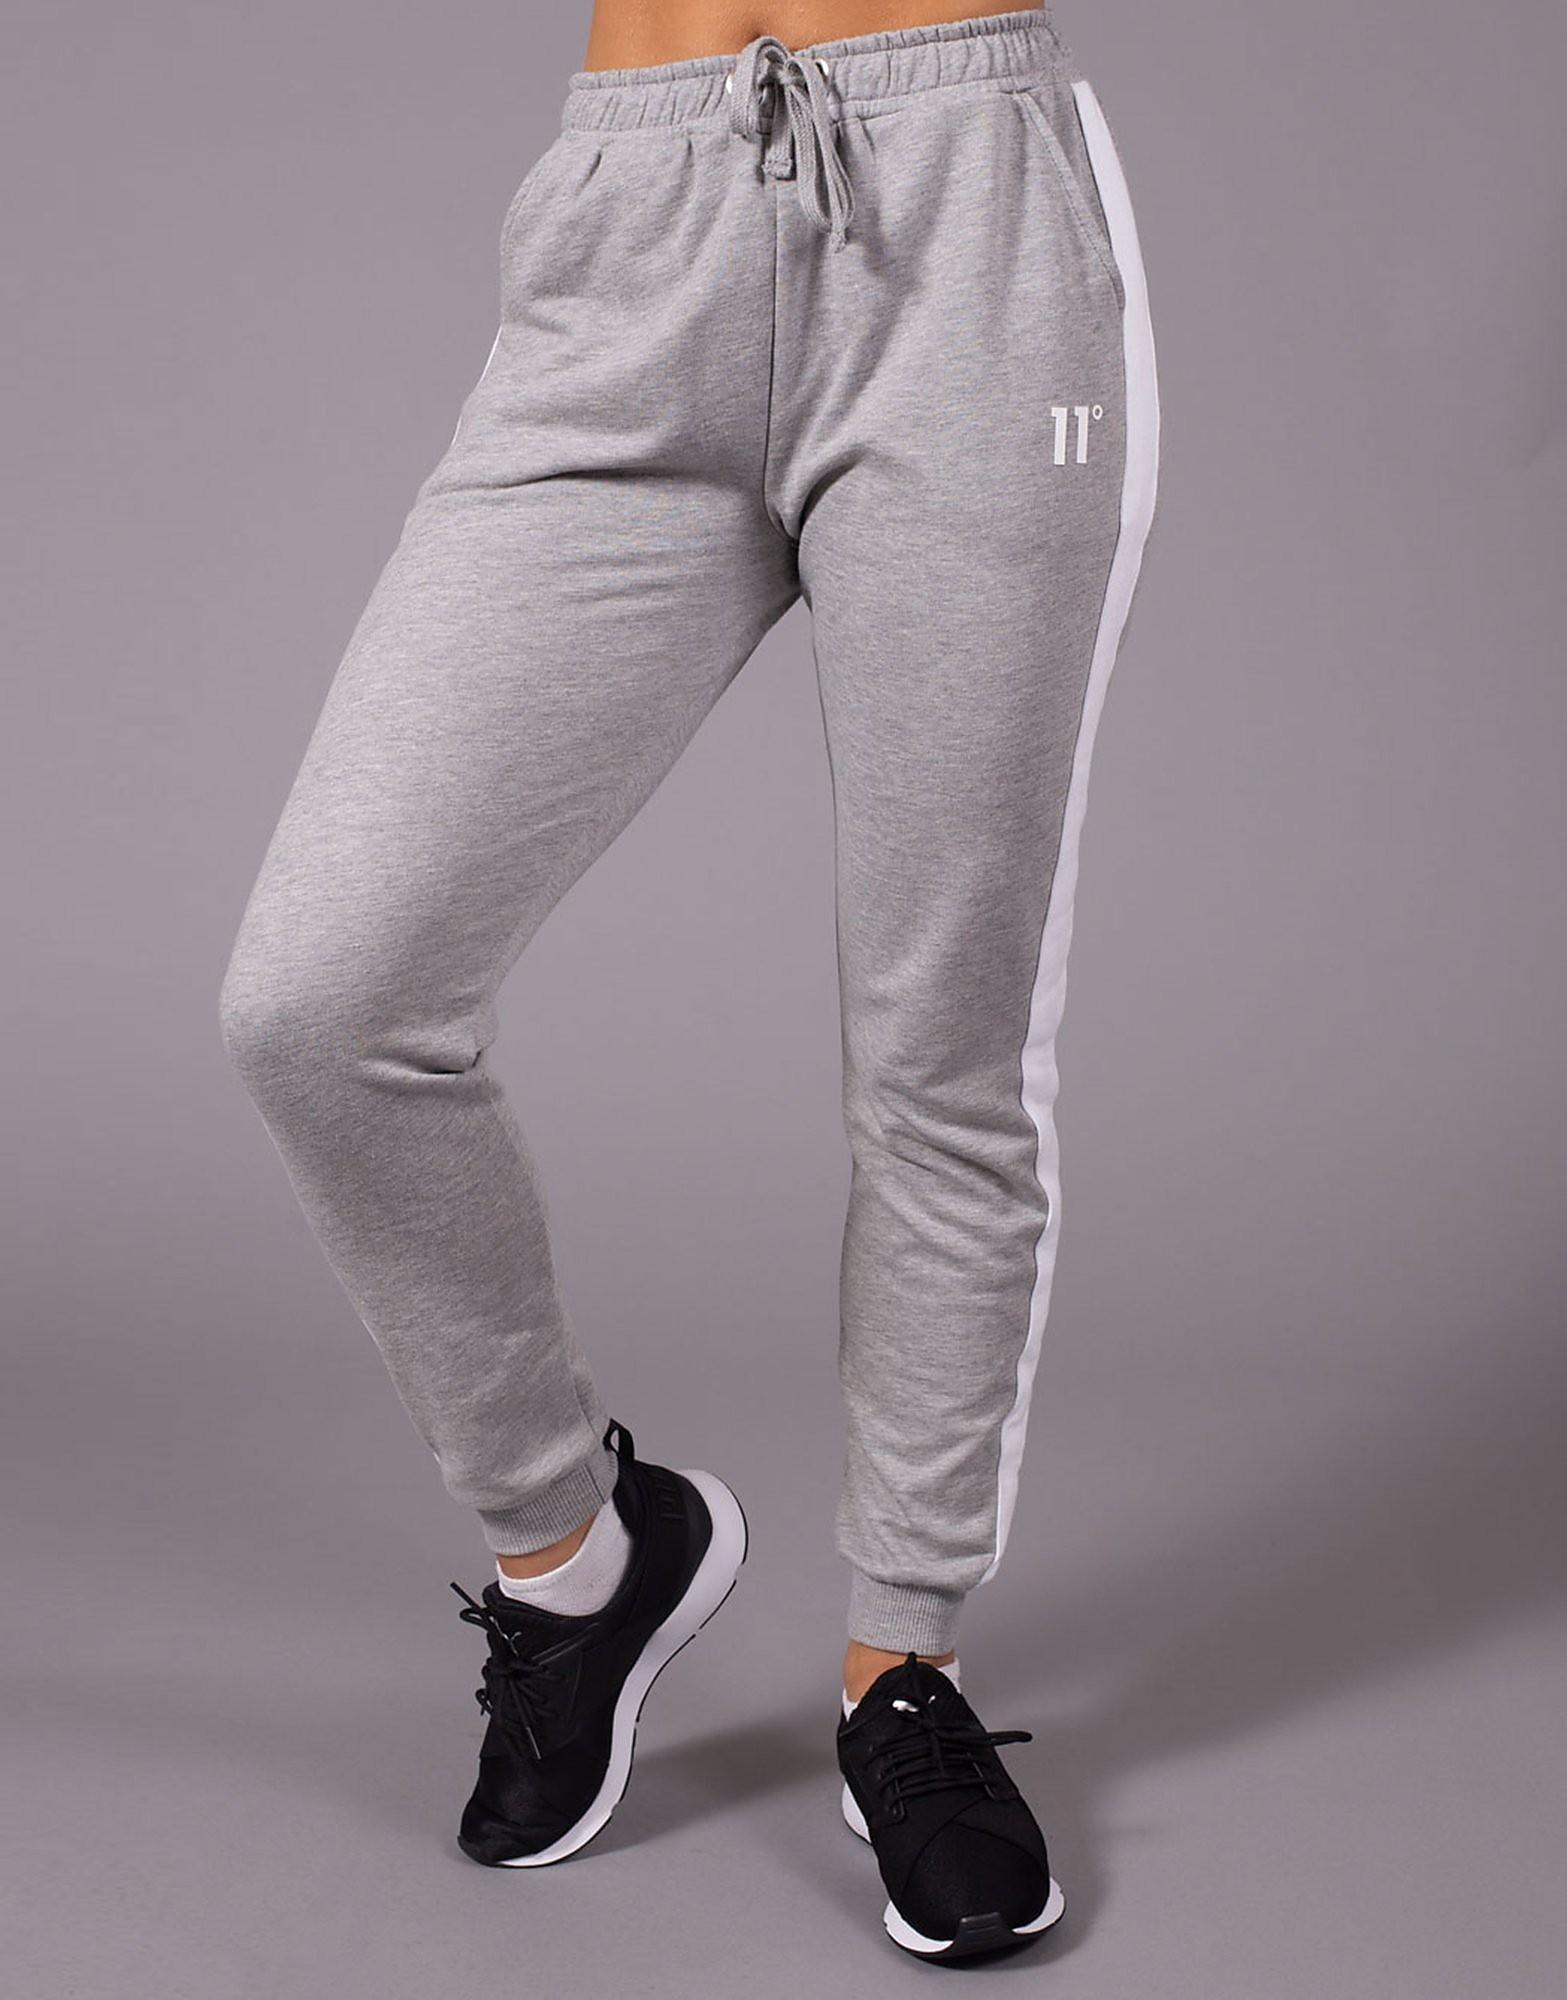 11 Degrees Panel Fleece Track Pants - Grijs - Dames